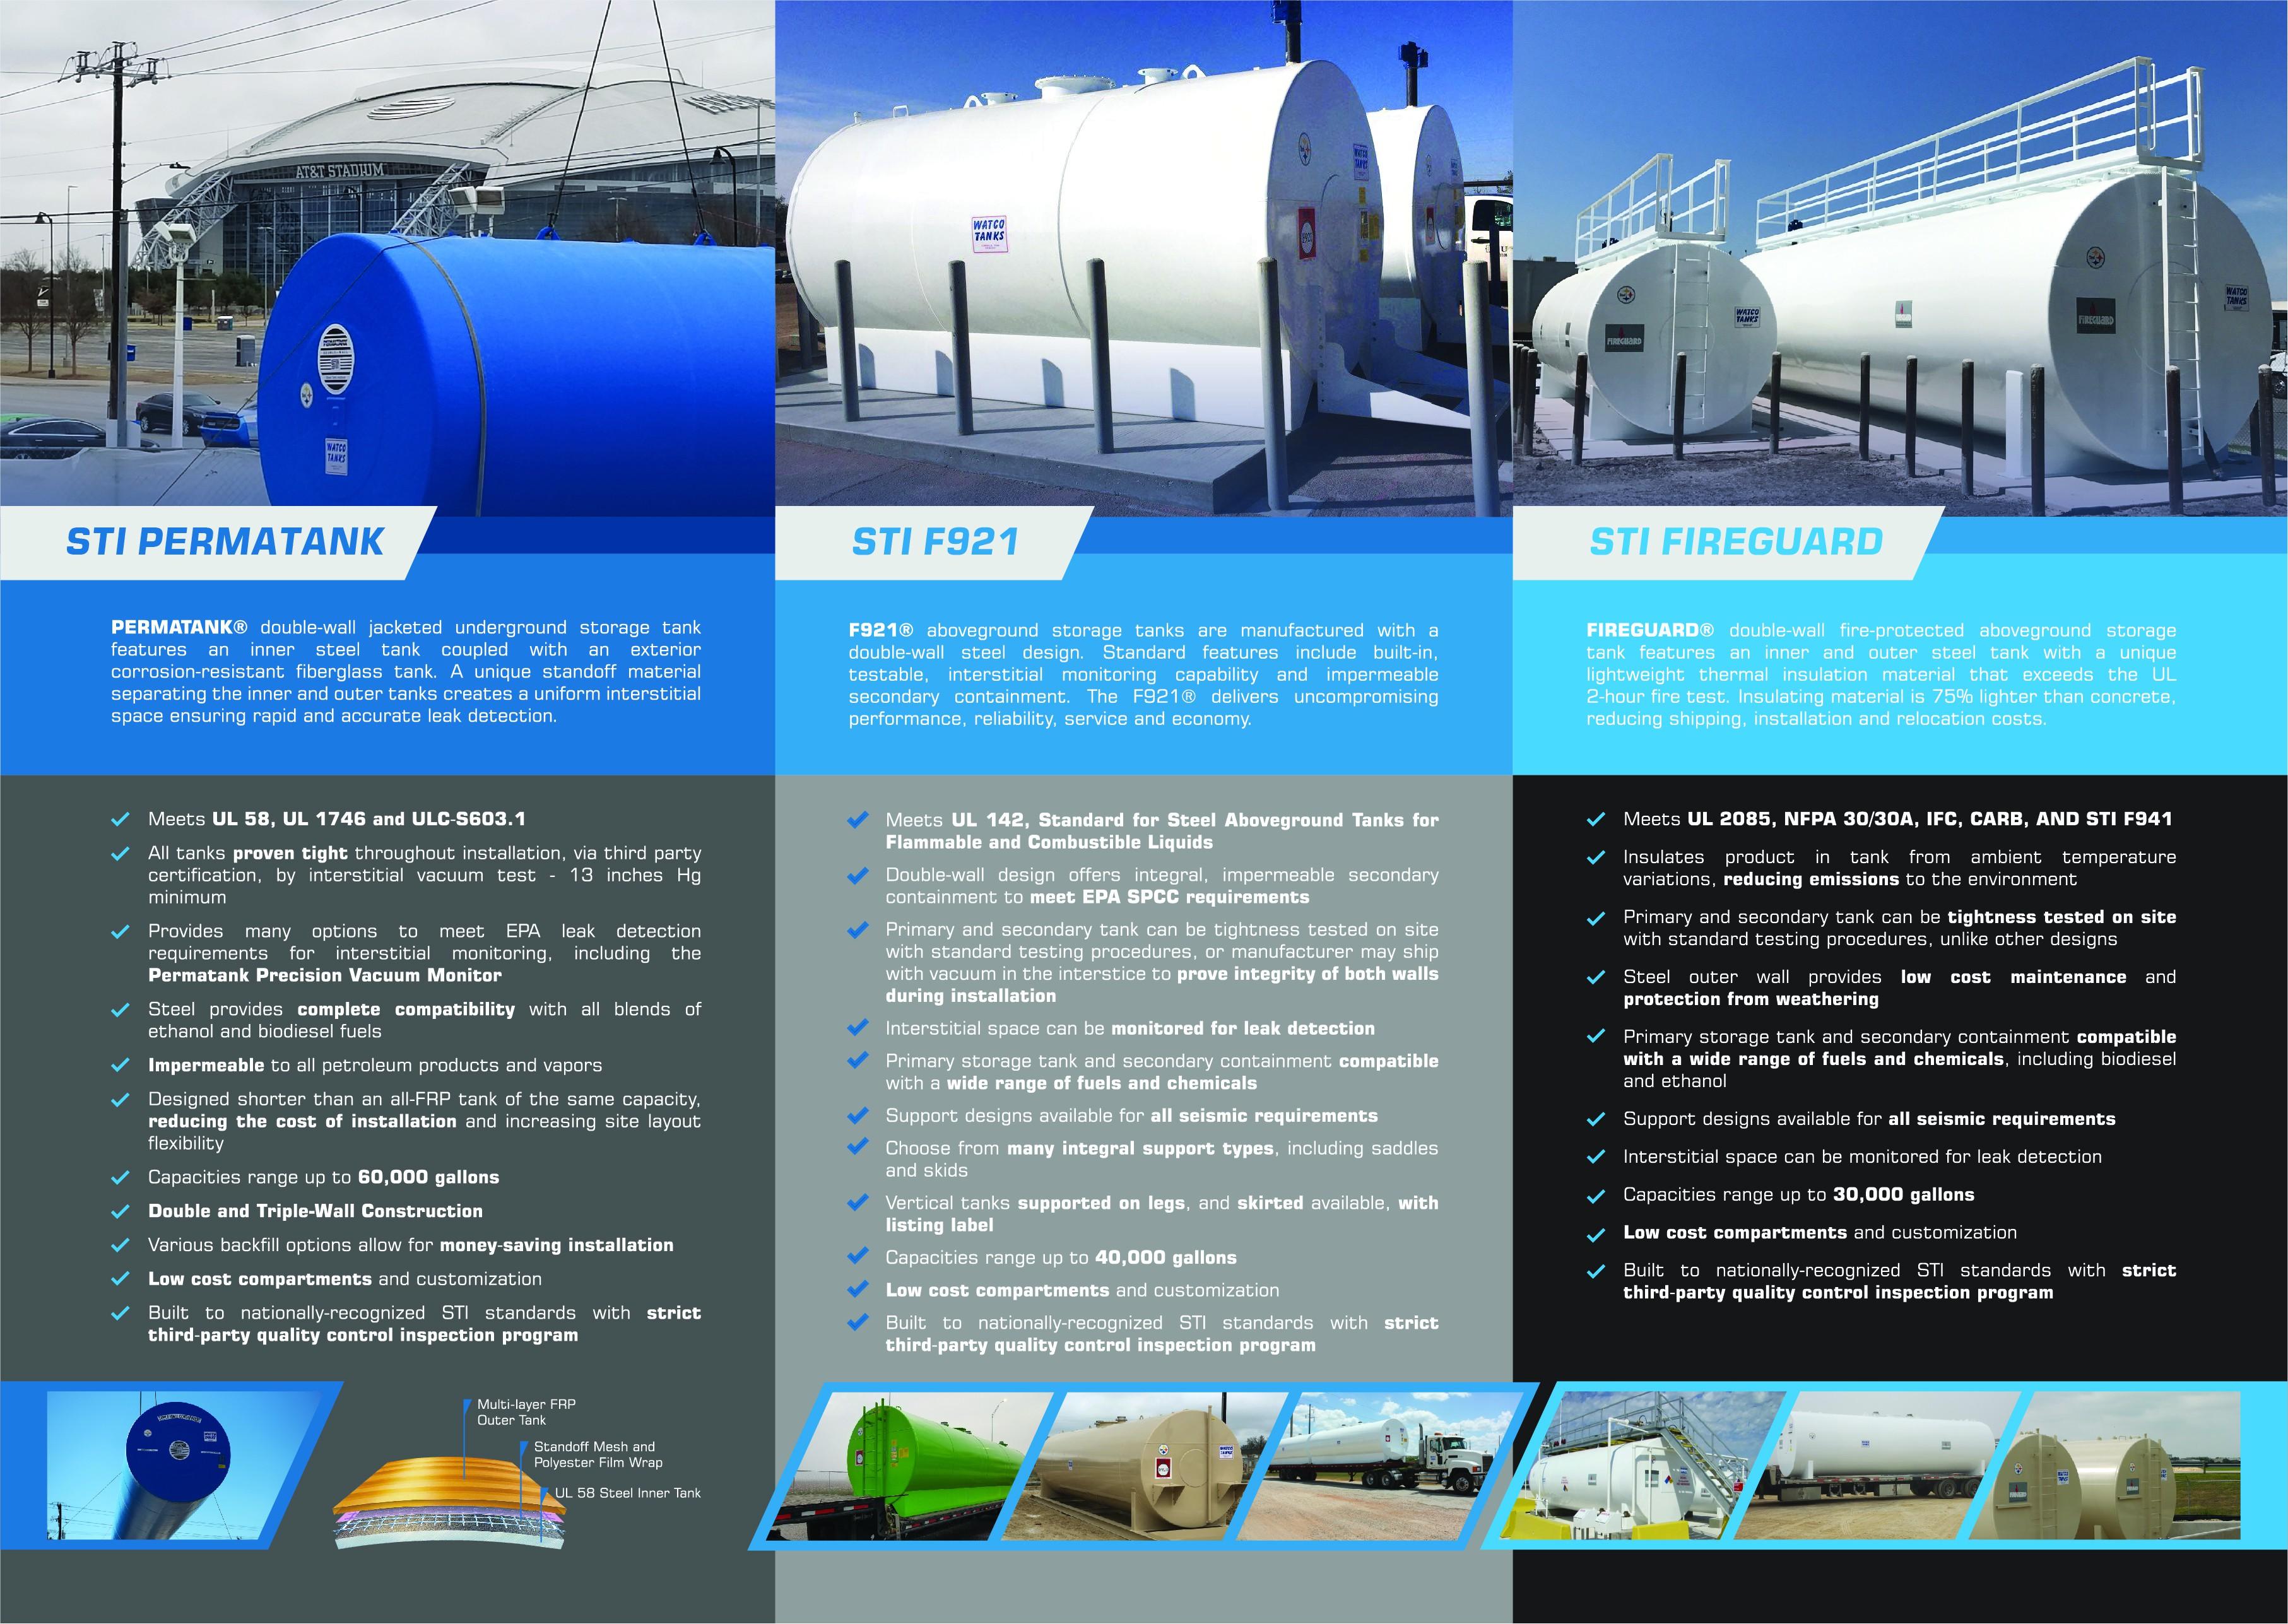 Watco Tanks Product Brochure